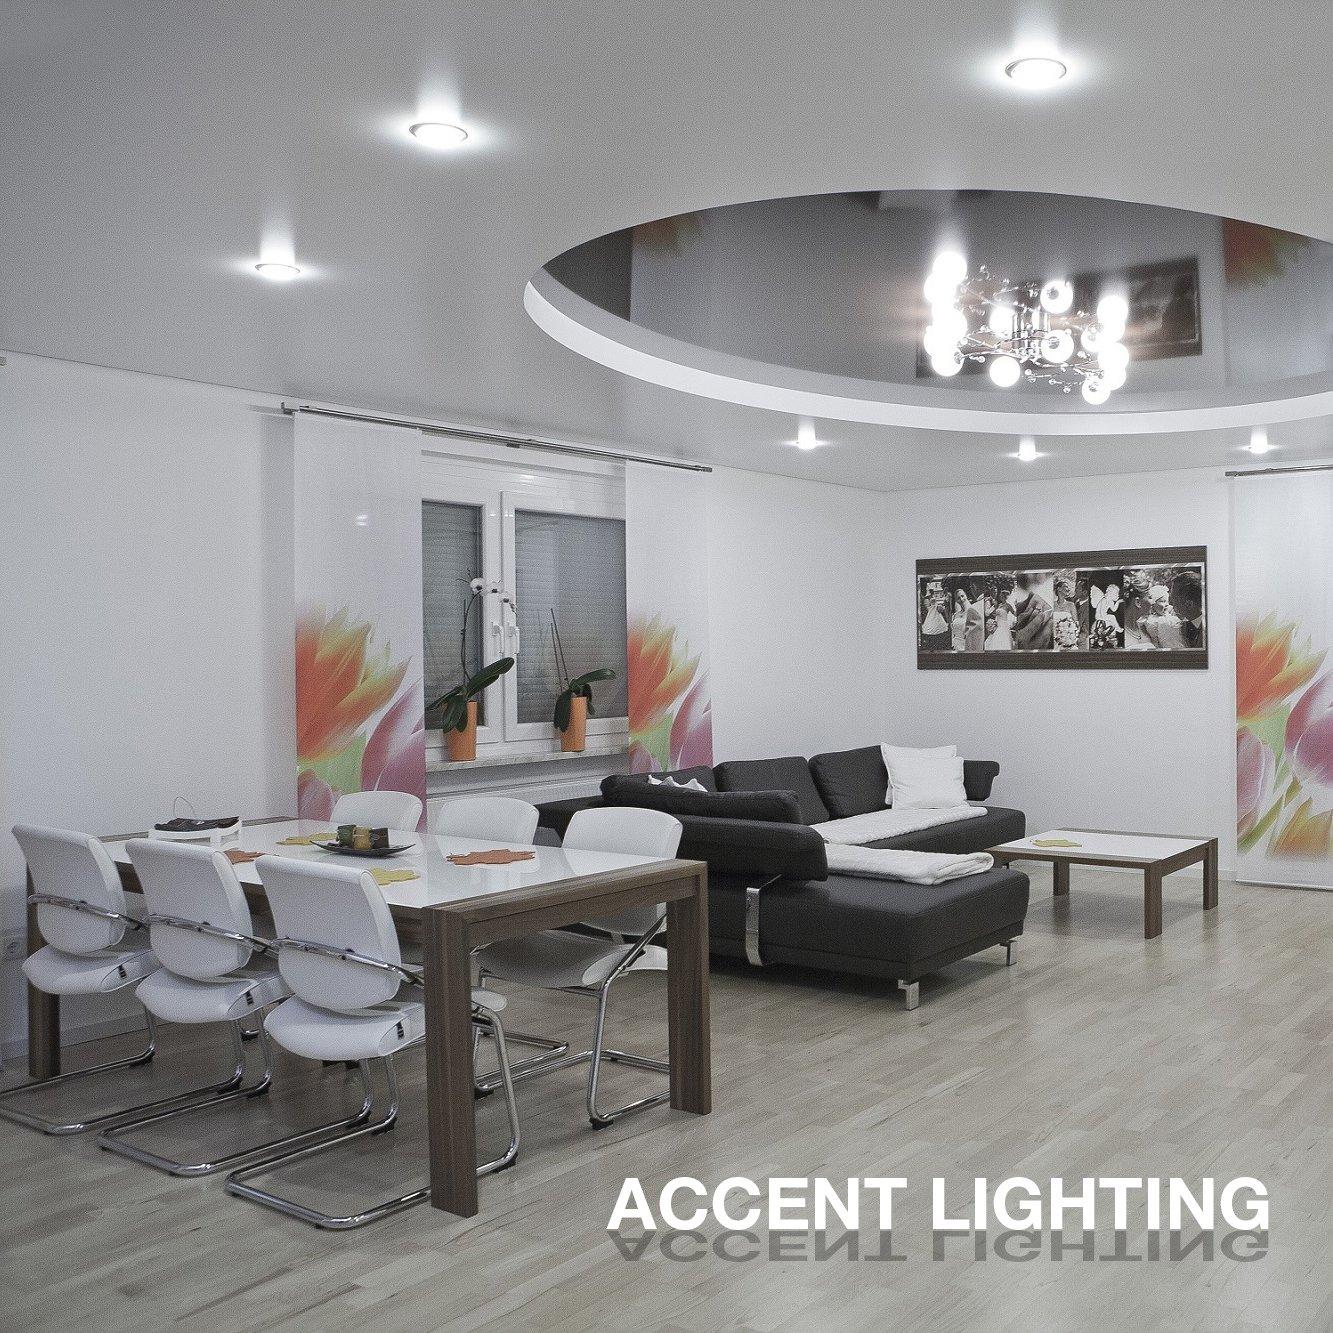 APL1628 GU10 12 Volts 35 Watt Halogen Light Bulbs 2,000 Life Hours Bright Crisp Output 2-Pack ETOPLIGHTING